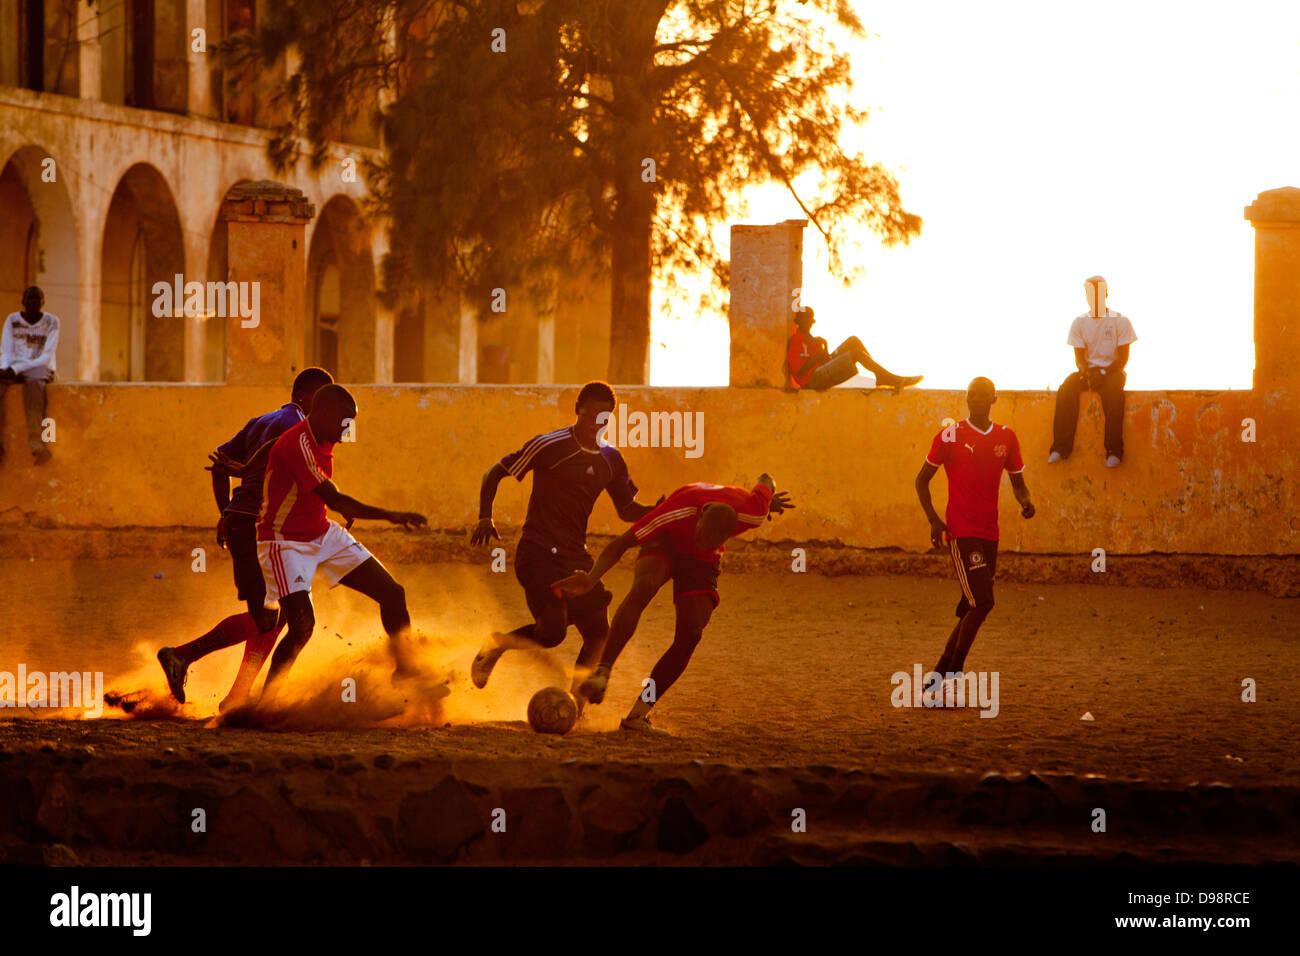 Fútbol en la plaza principal de la isla de Gorée, Dakar, Senegal. Imagen De Stock